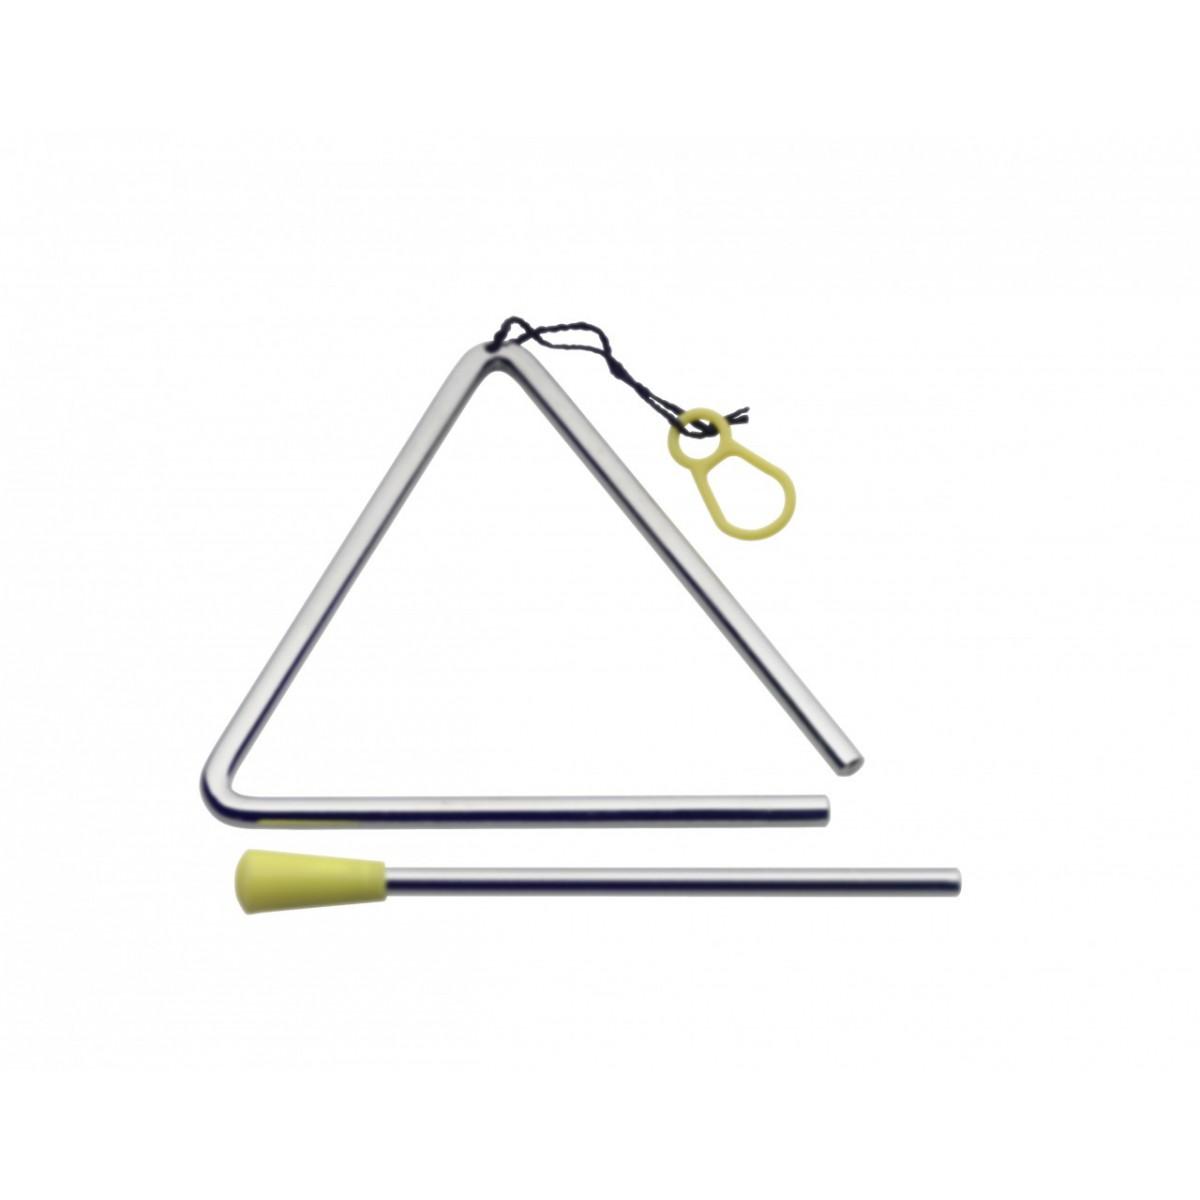 triangel, Metall